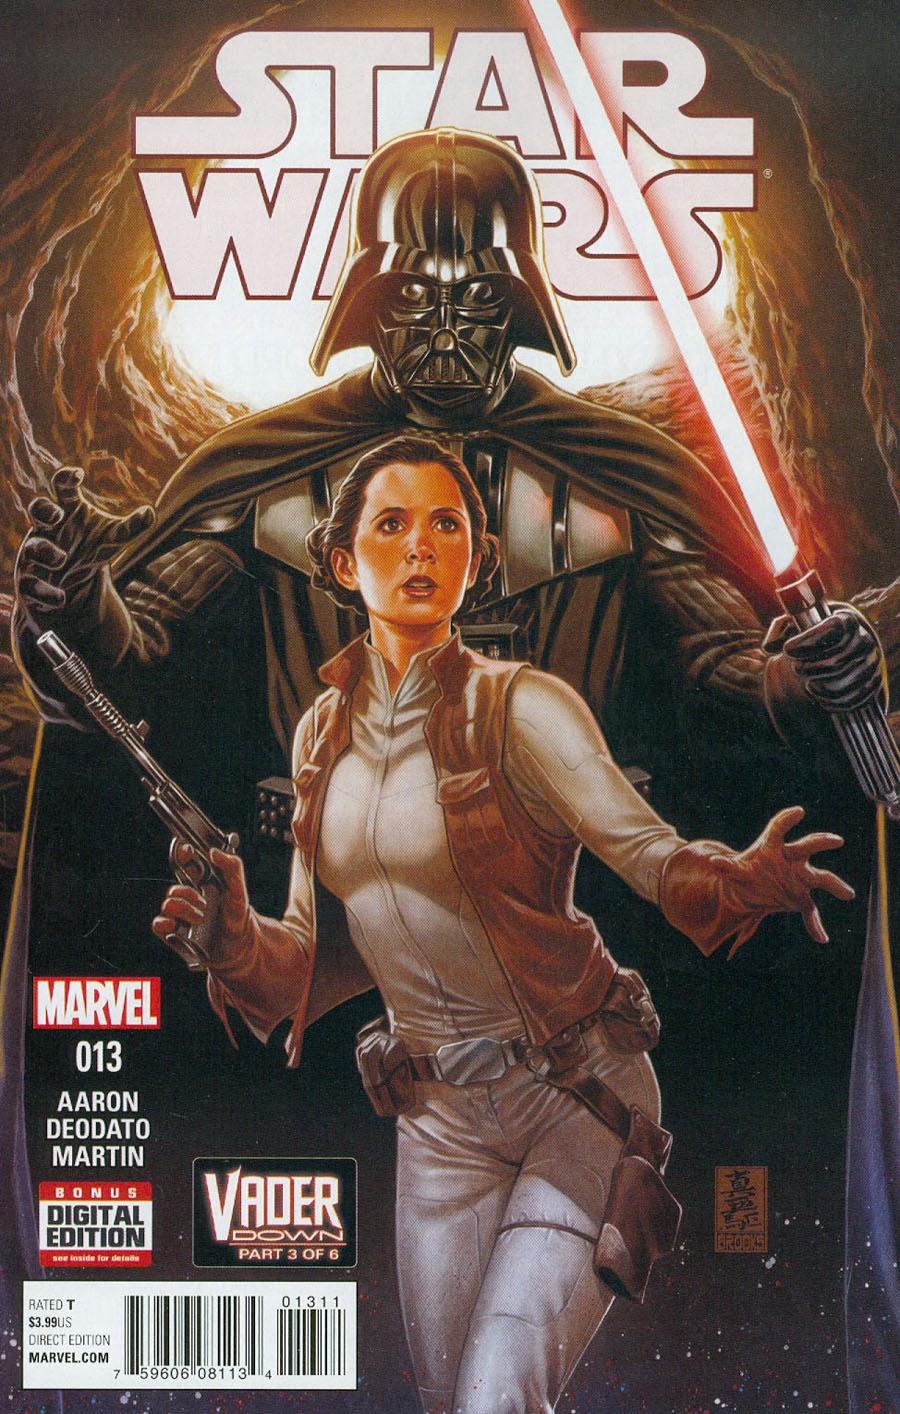 Star Wars Vol 4 #13 Cover A 1st Ptg Regular Mark Brooks Cover (Vader Down Part 3)